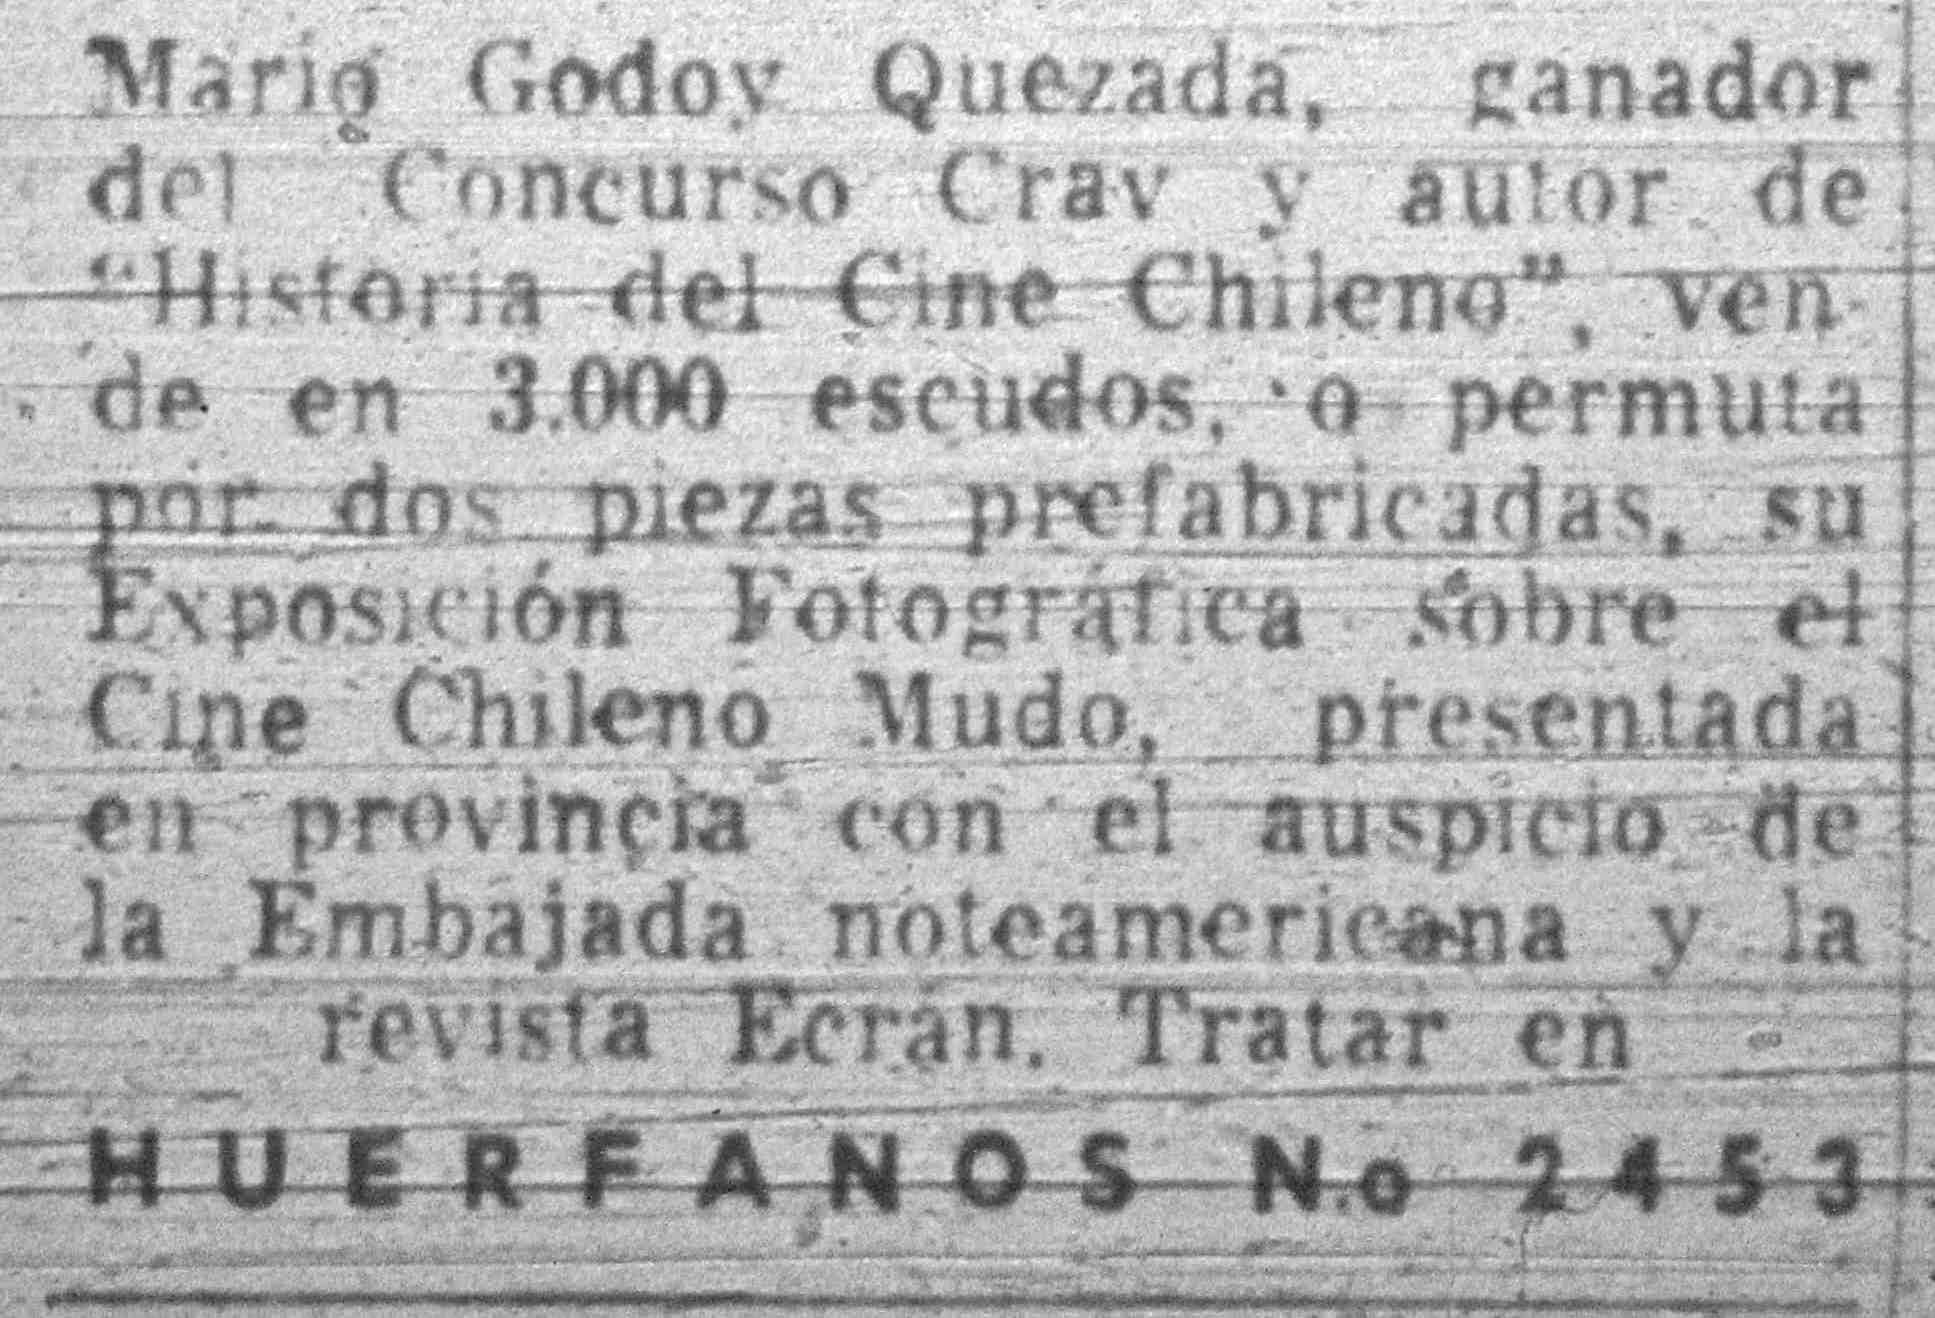 19690702_ElMercurio_CineChilenoMudo_MarioGodoy_baja2.jpg